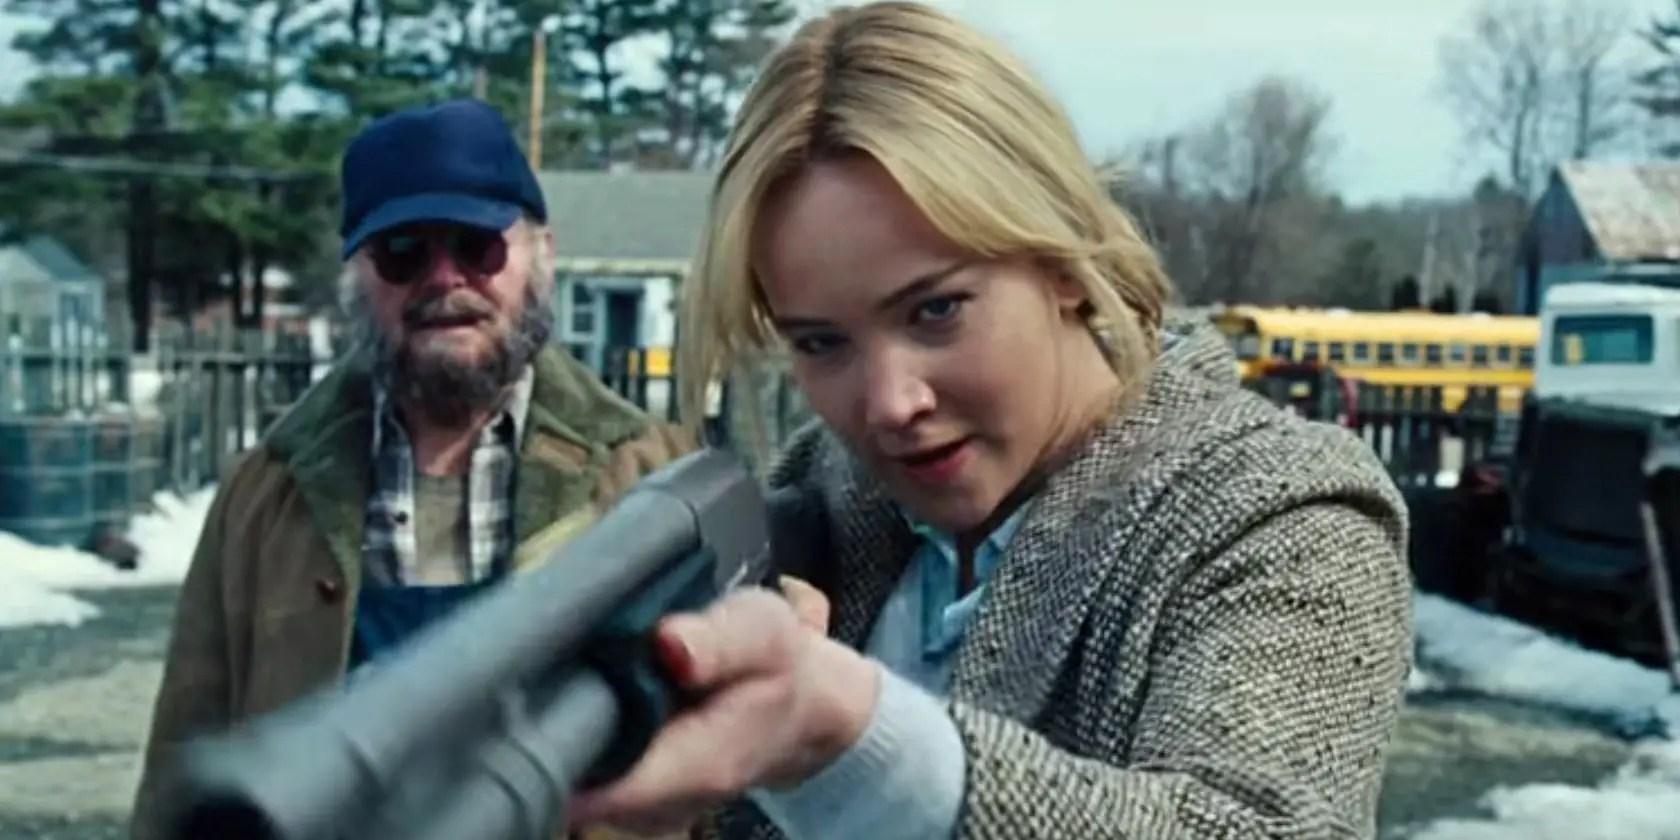 https://i2.wp.com/static1.businessinsider.com/image/5627f6009dd7cc19008c3b32-1200-630/jennifer-lawrence-saves-her-latest-oscar-hopeful-movie-joy-from-being-a-total-disaster.jpg